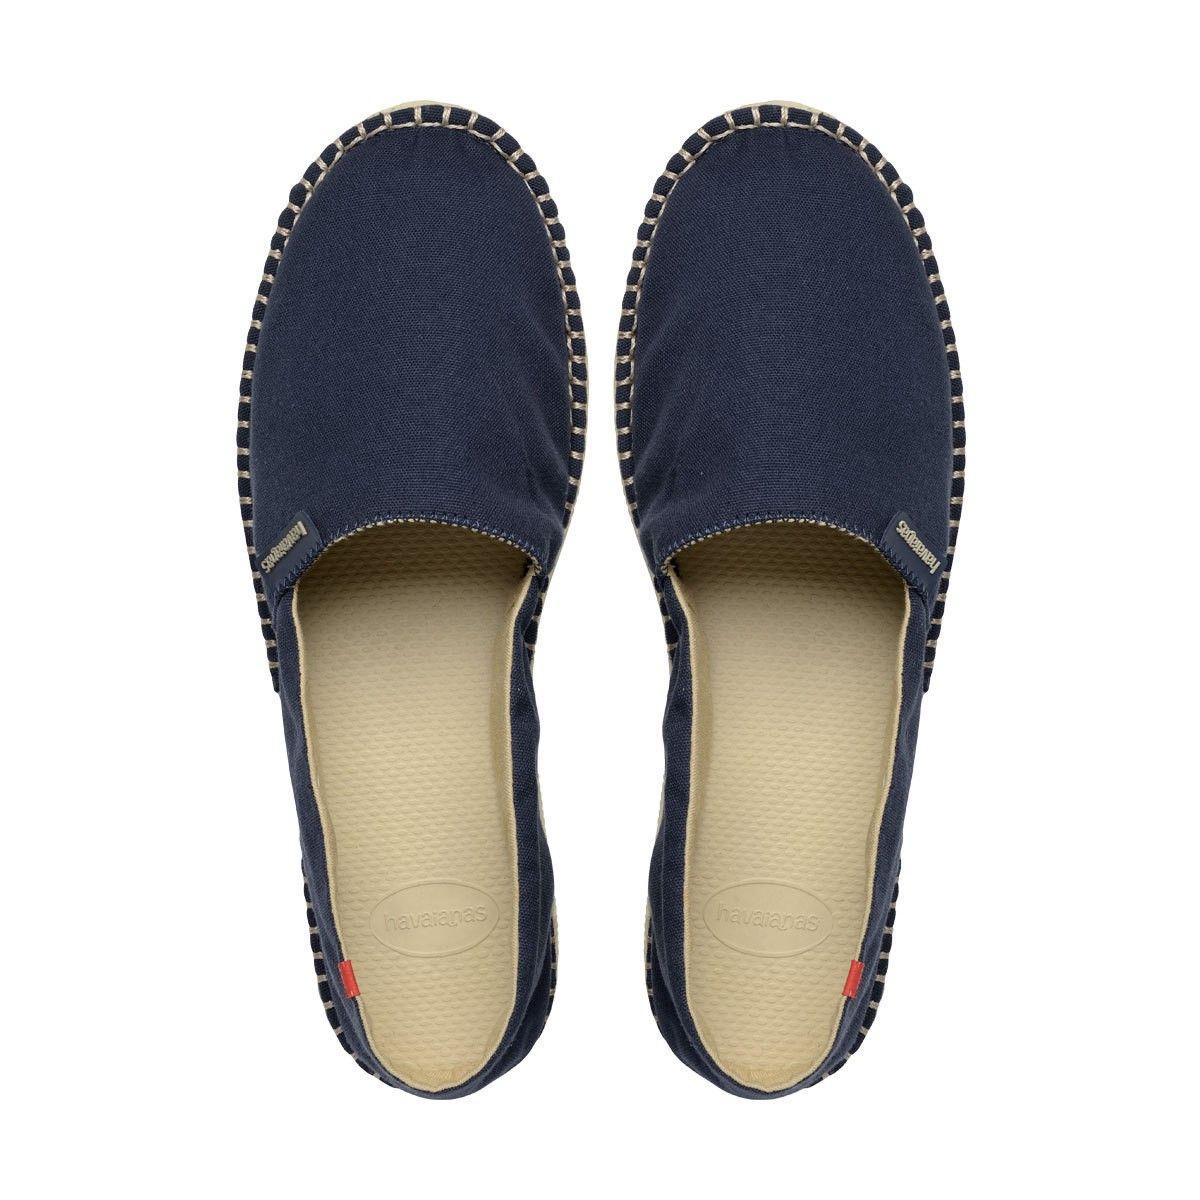 4023f3386 HAVAIANAS ORIGINE II ESPADRILLE NAVY SAND.  havaianas  shoes ...